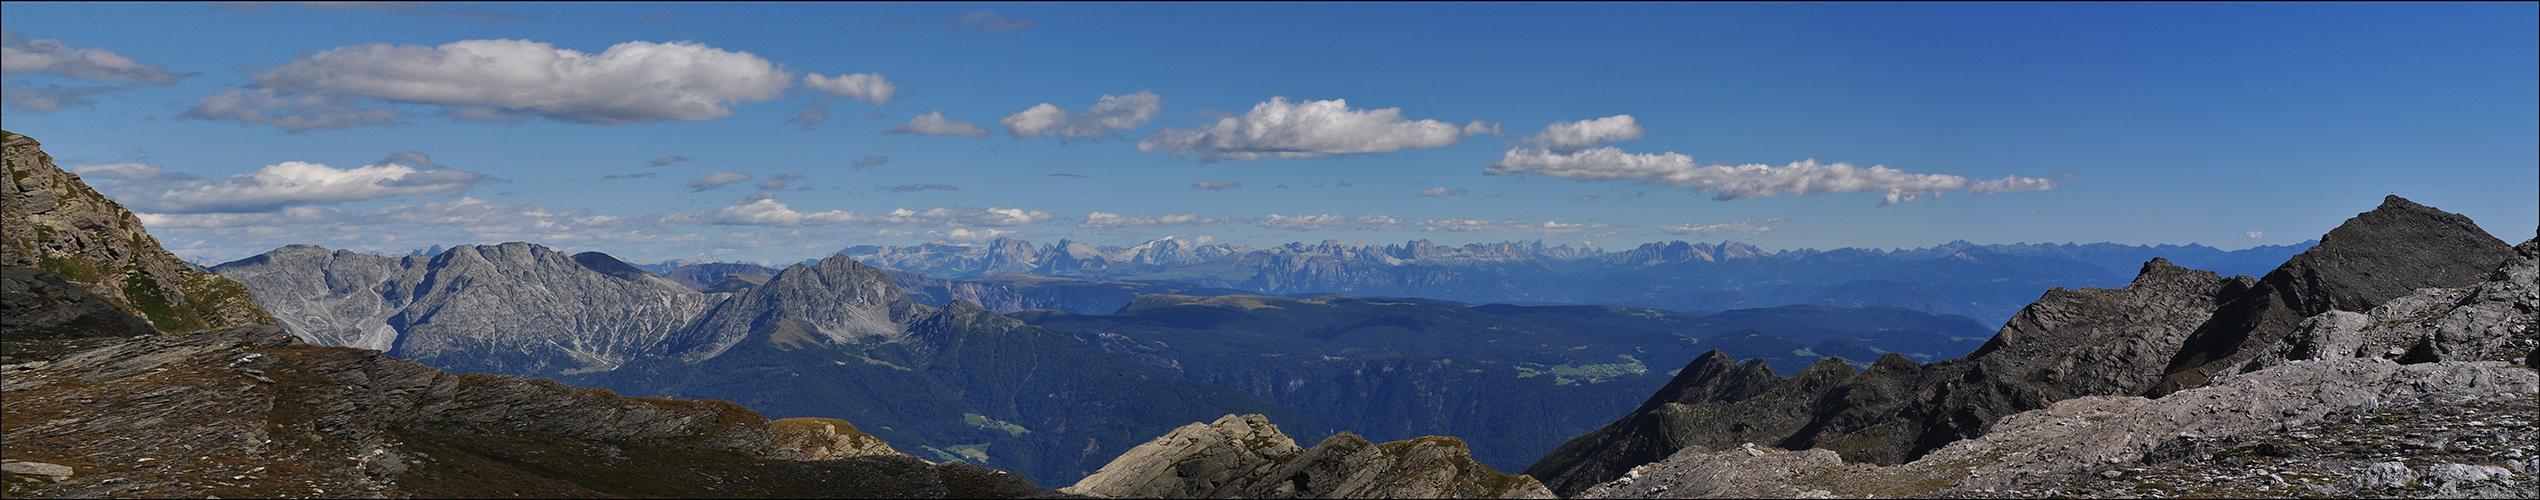 Das Dolomiten-Panorama